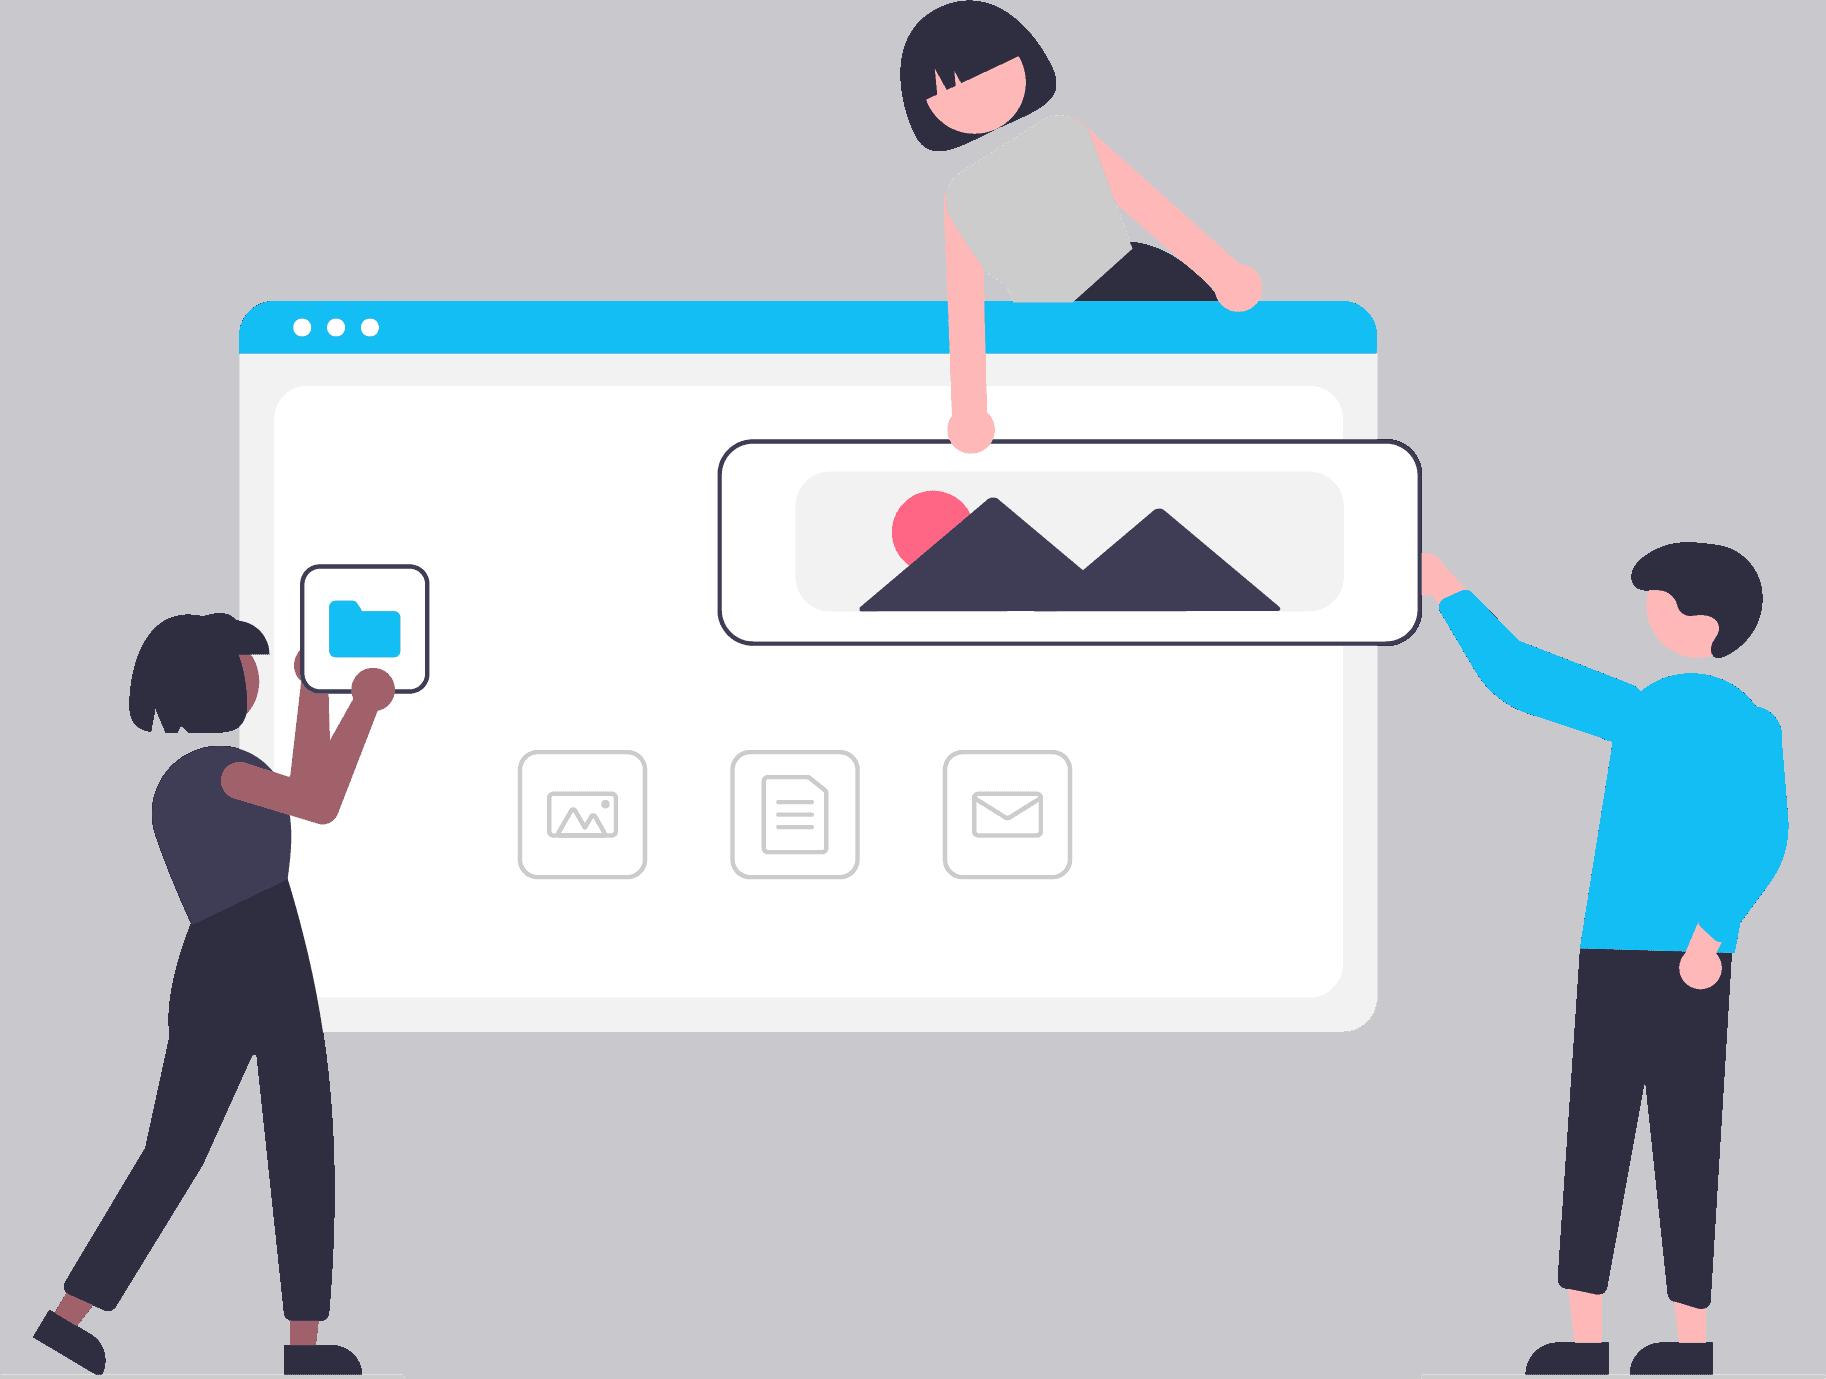 Intuitive IT - Building websites